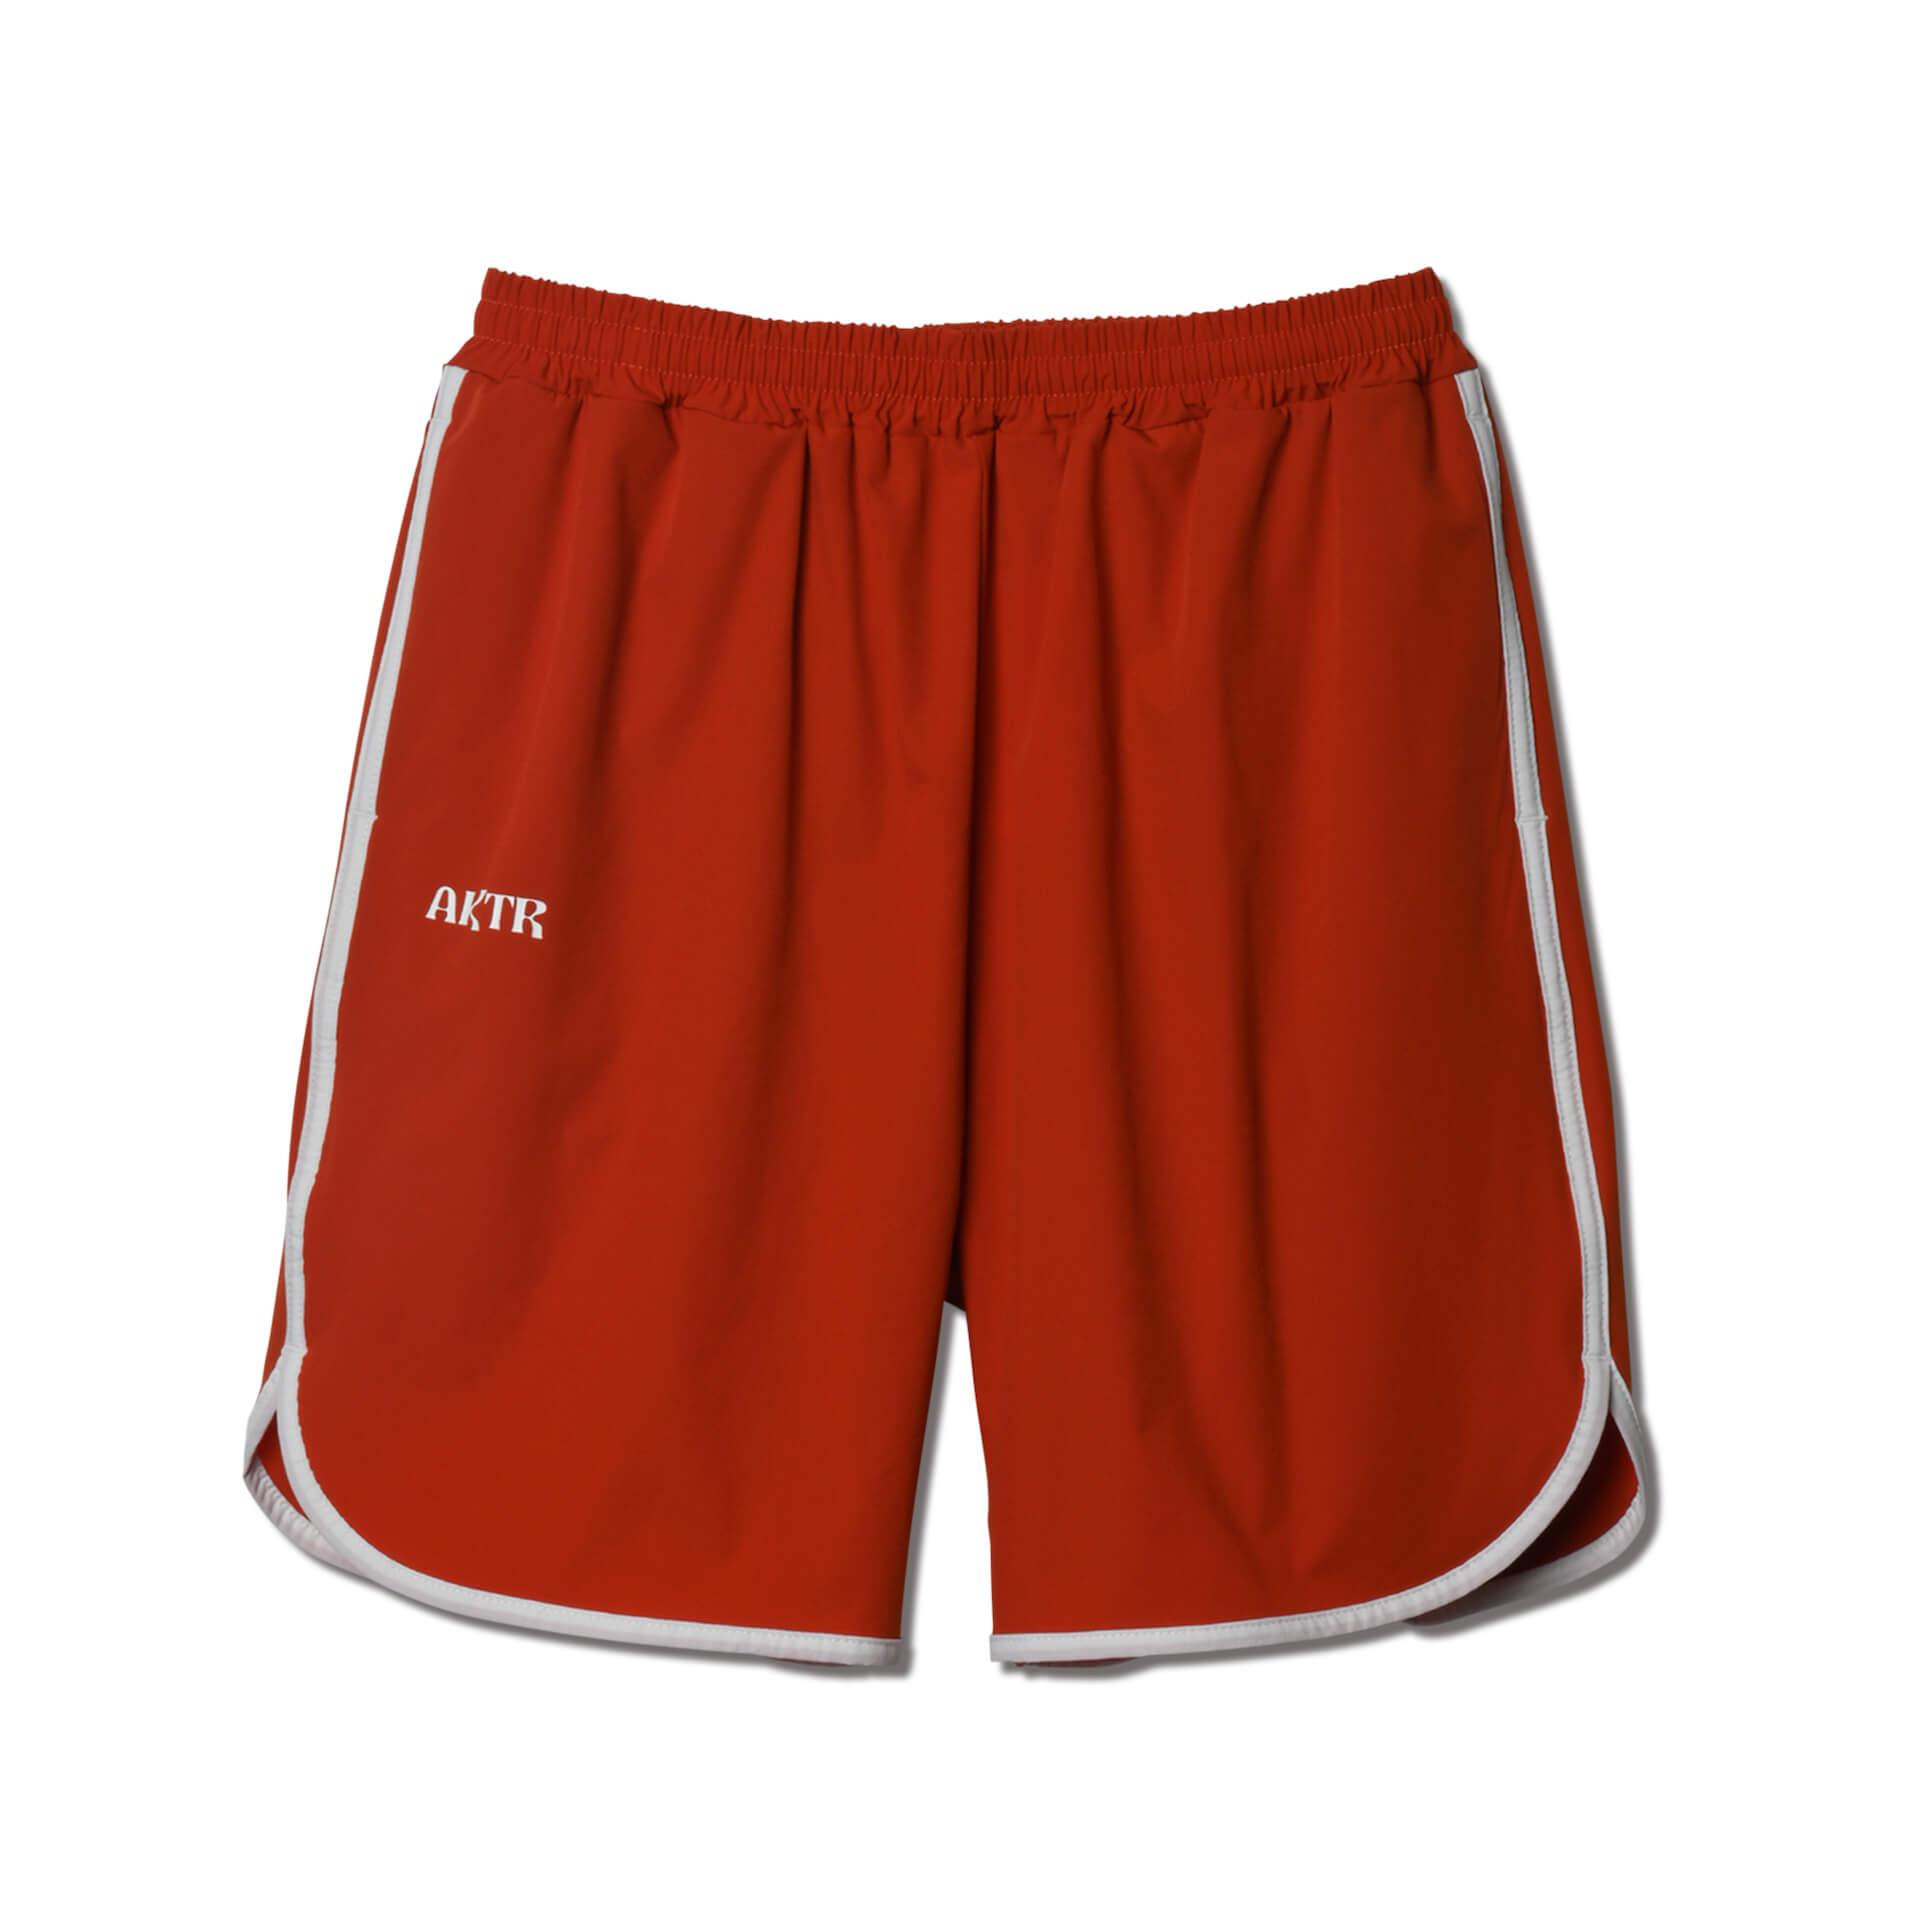 AKTRがオリジナルウィメンズライン「BREEZE collection」を発売決定!ルックに女子プロバスケットボール選手の馬瓜ステファニーらが起用 life210924_aktr_breez_06